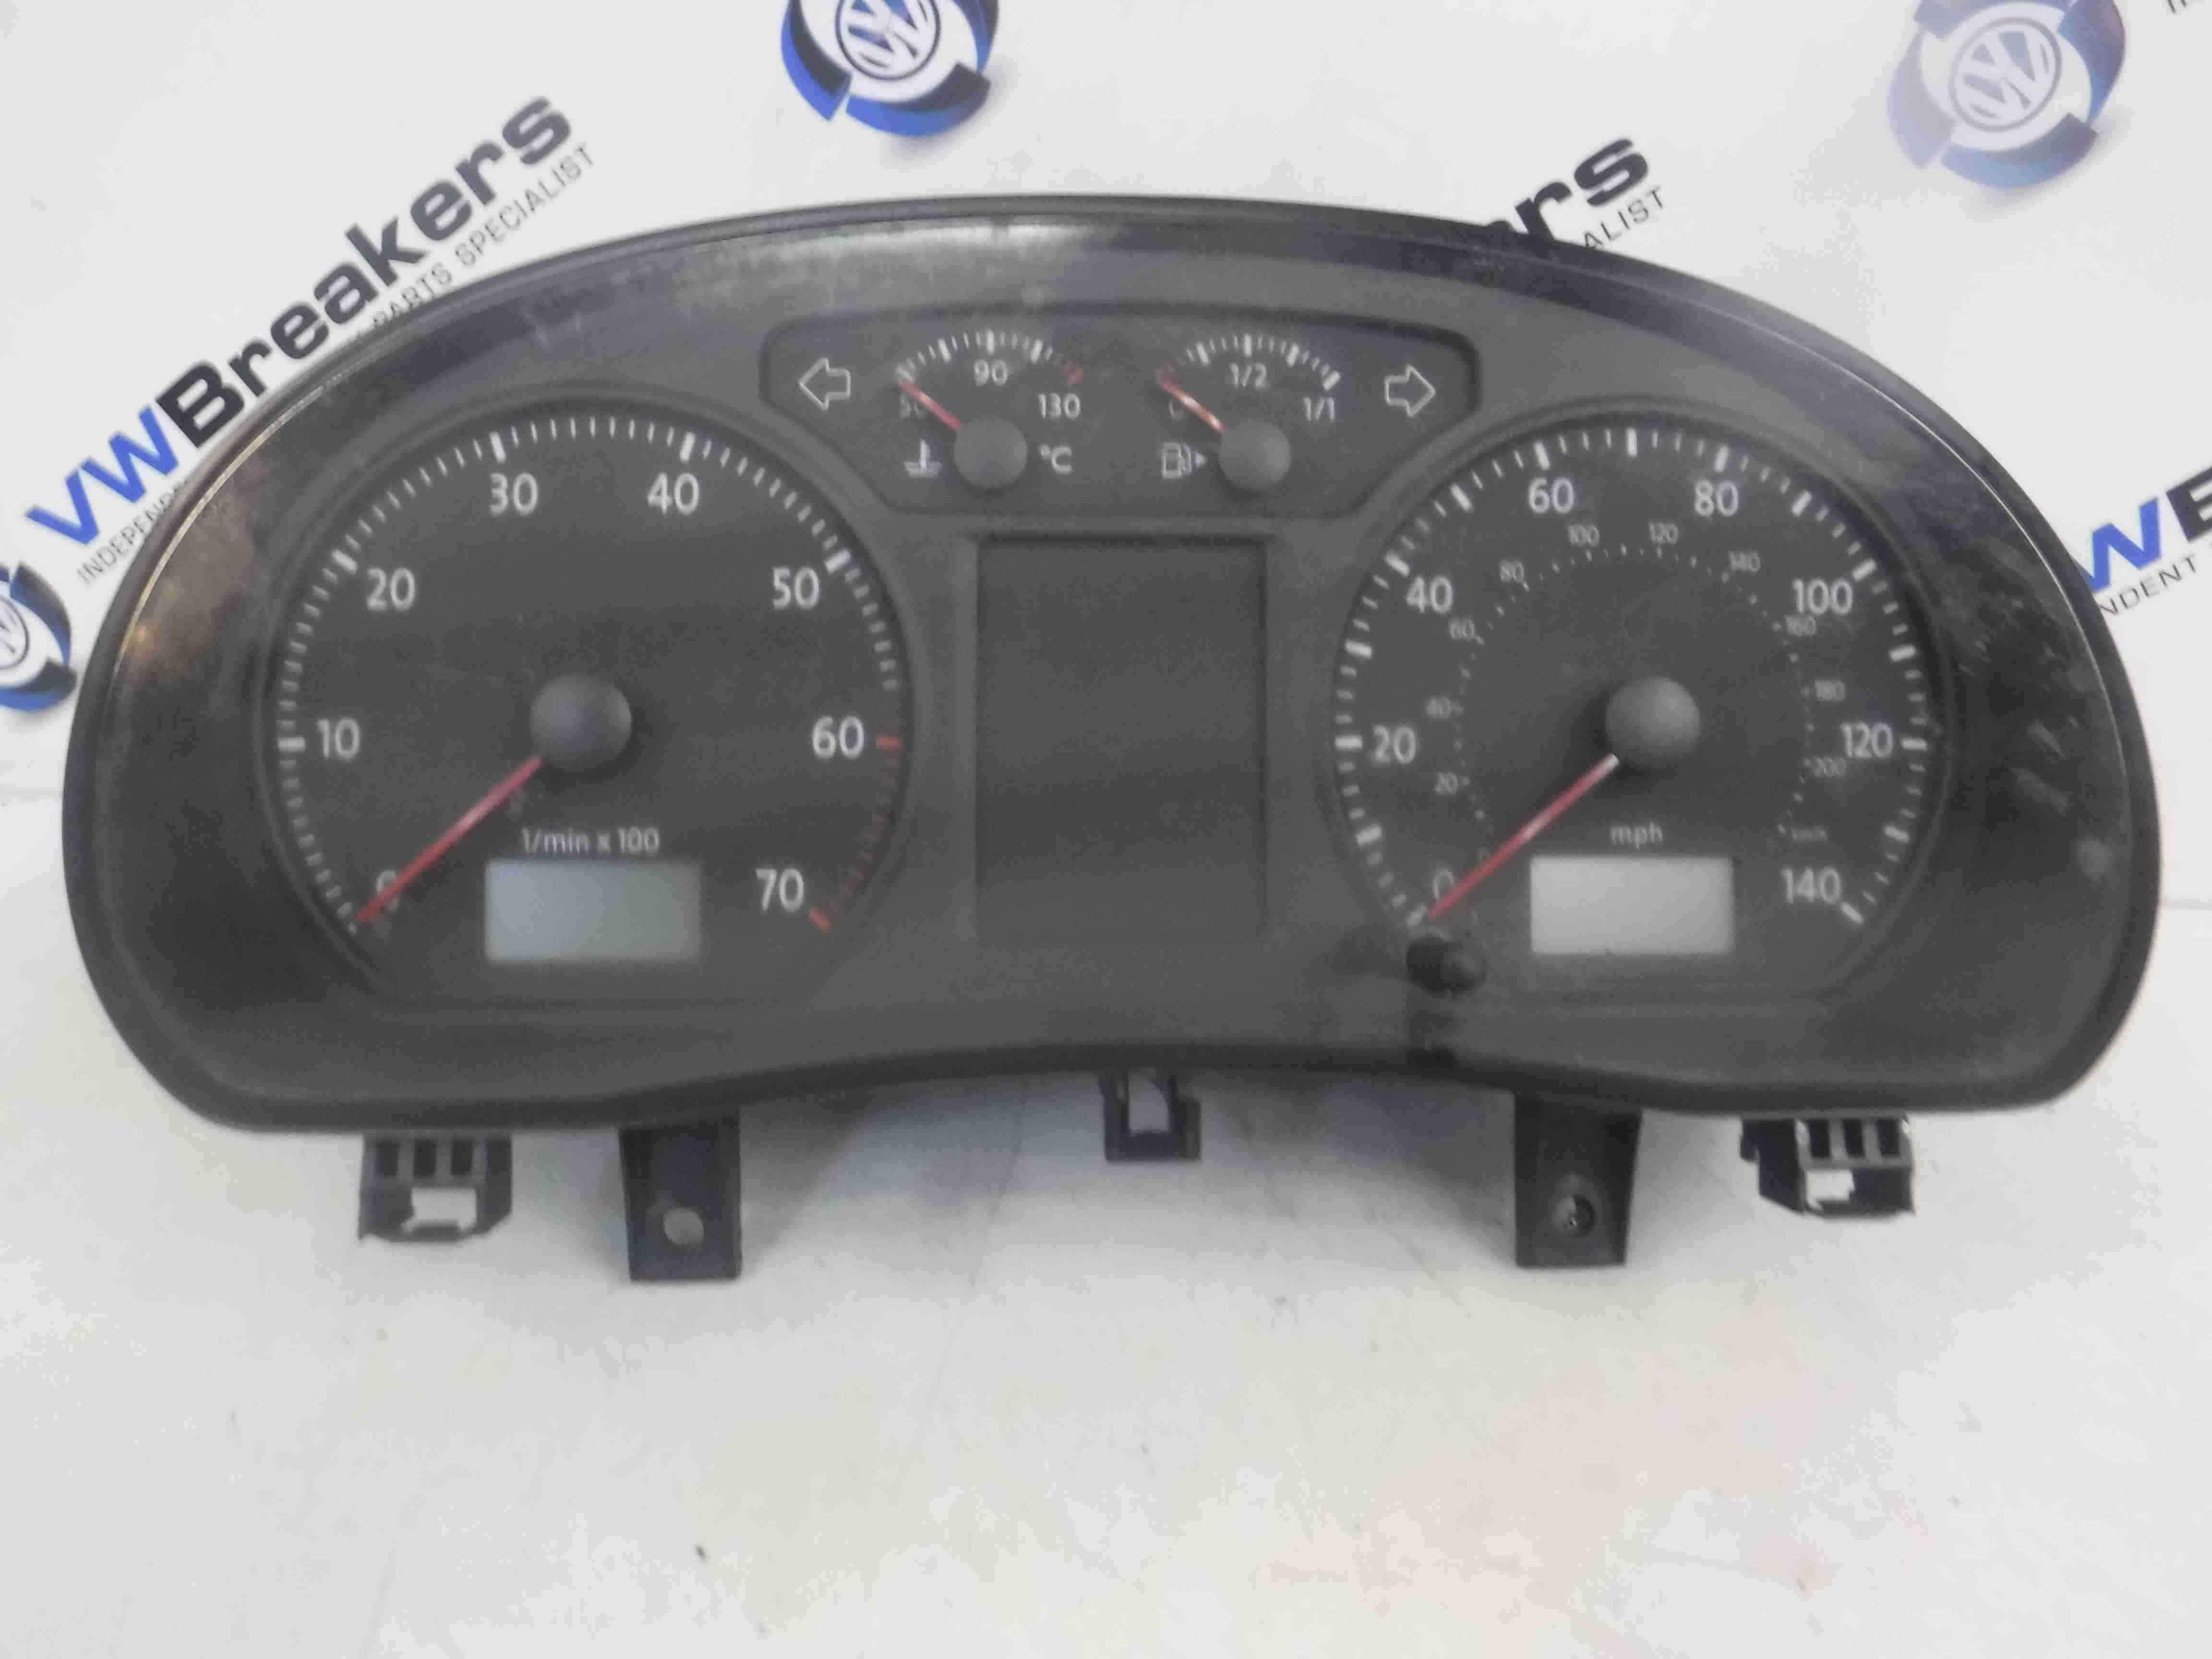 Volkswagen Polo 9N3 2006-2008 Instrument Panel Dials Clocks Cluster 93K